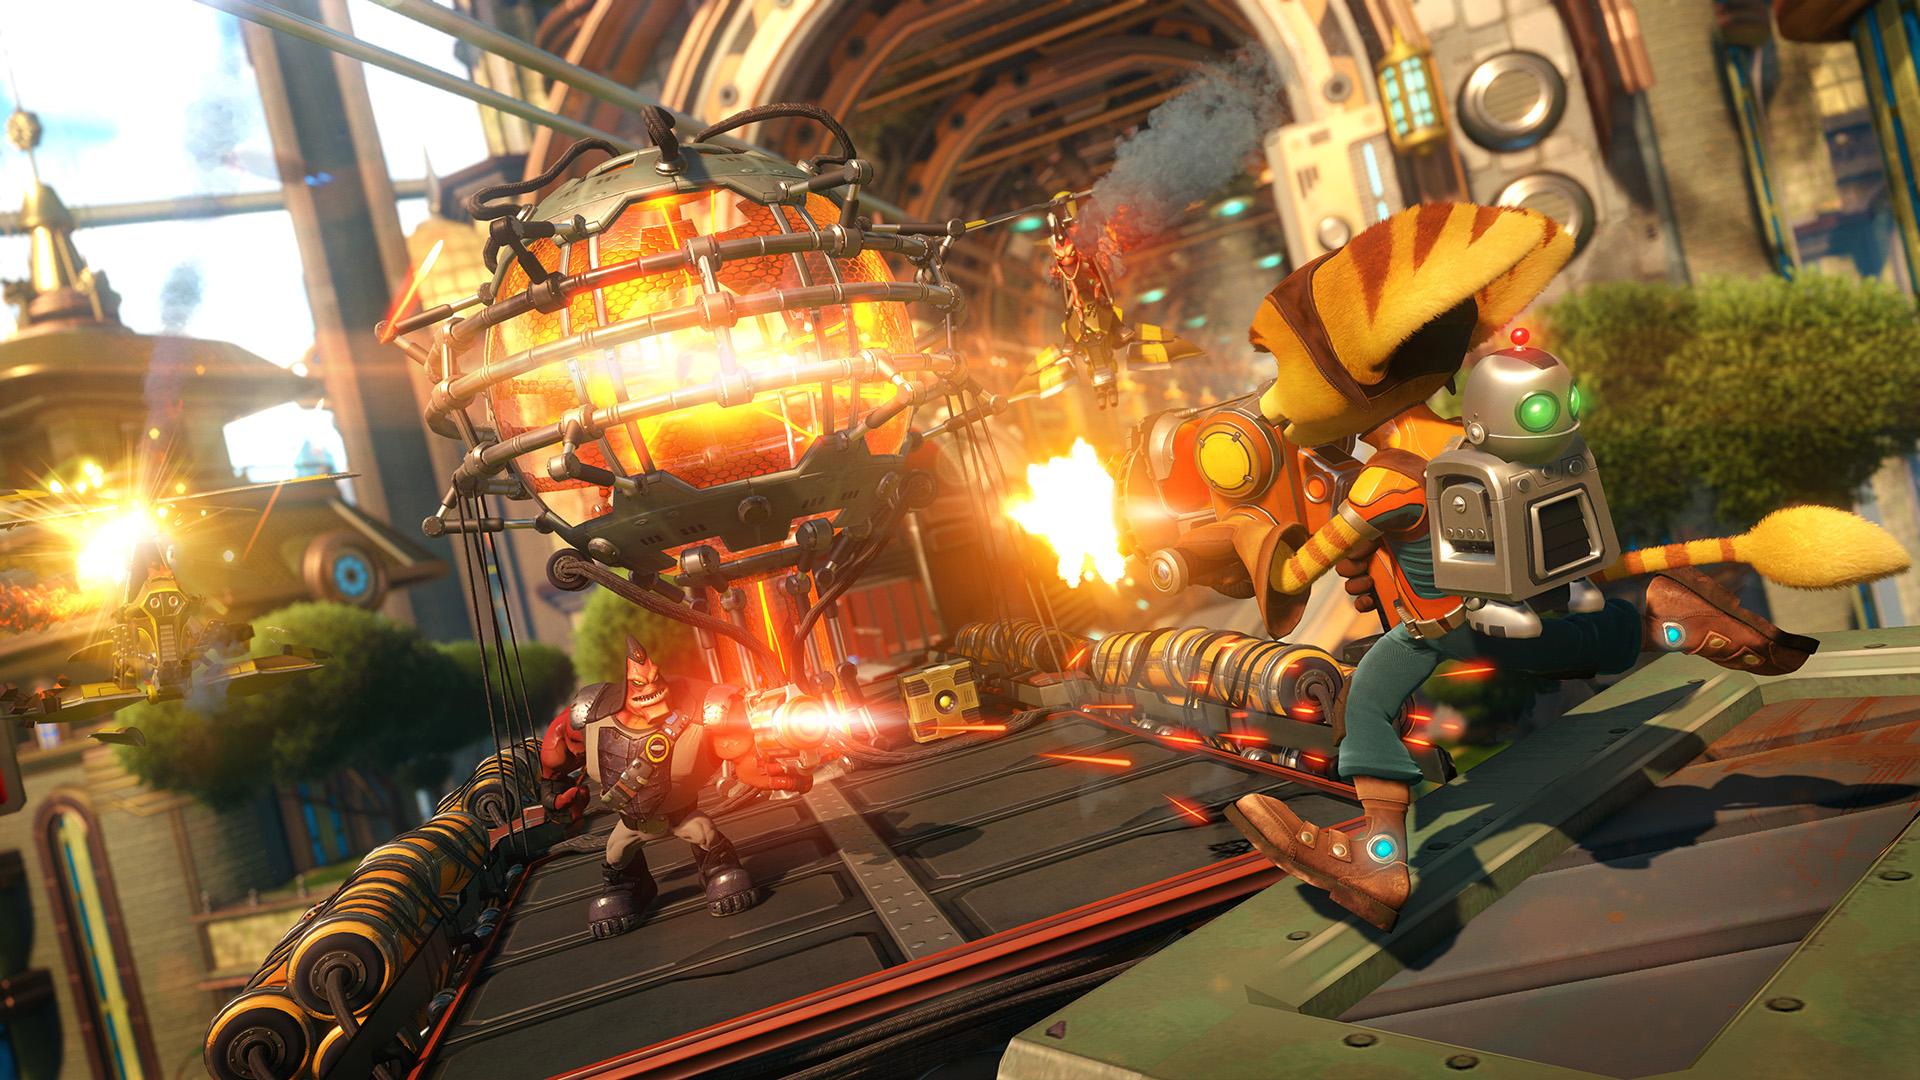 Rachet & Clank Ethugamer PS Plus.jpg